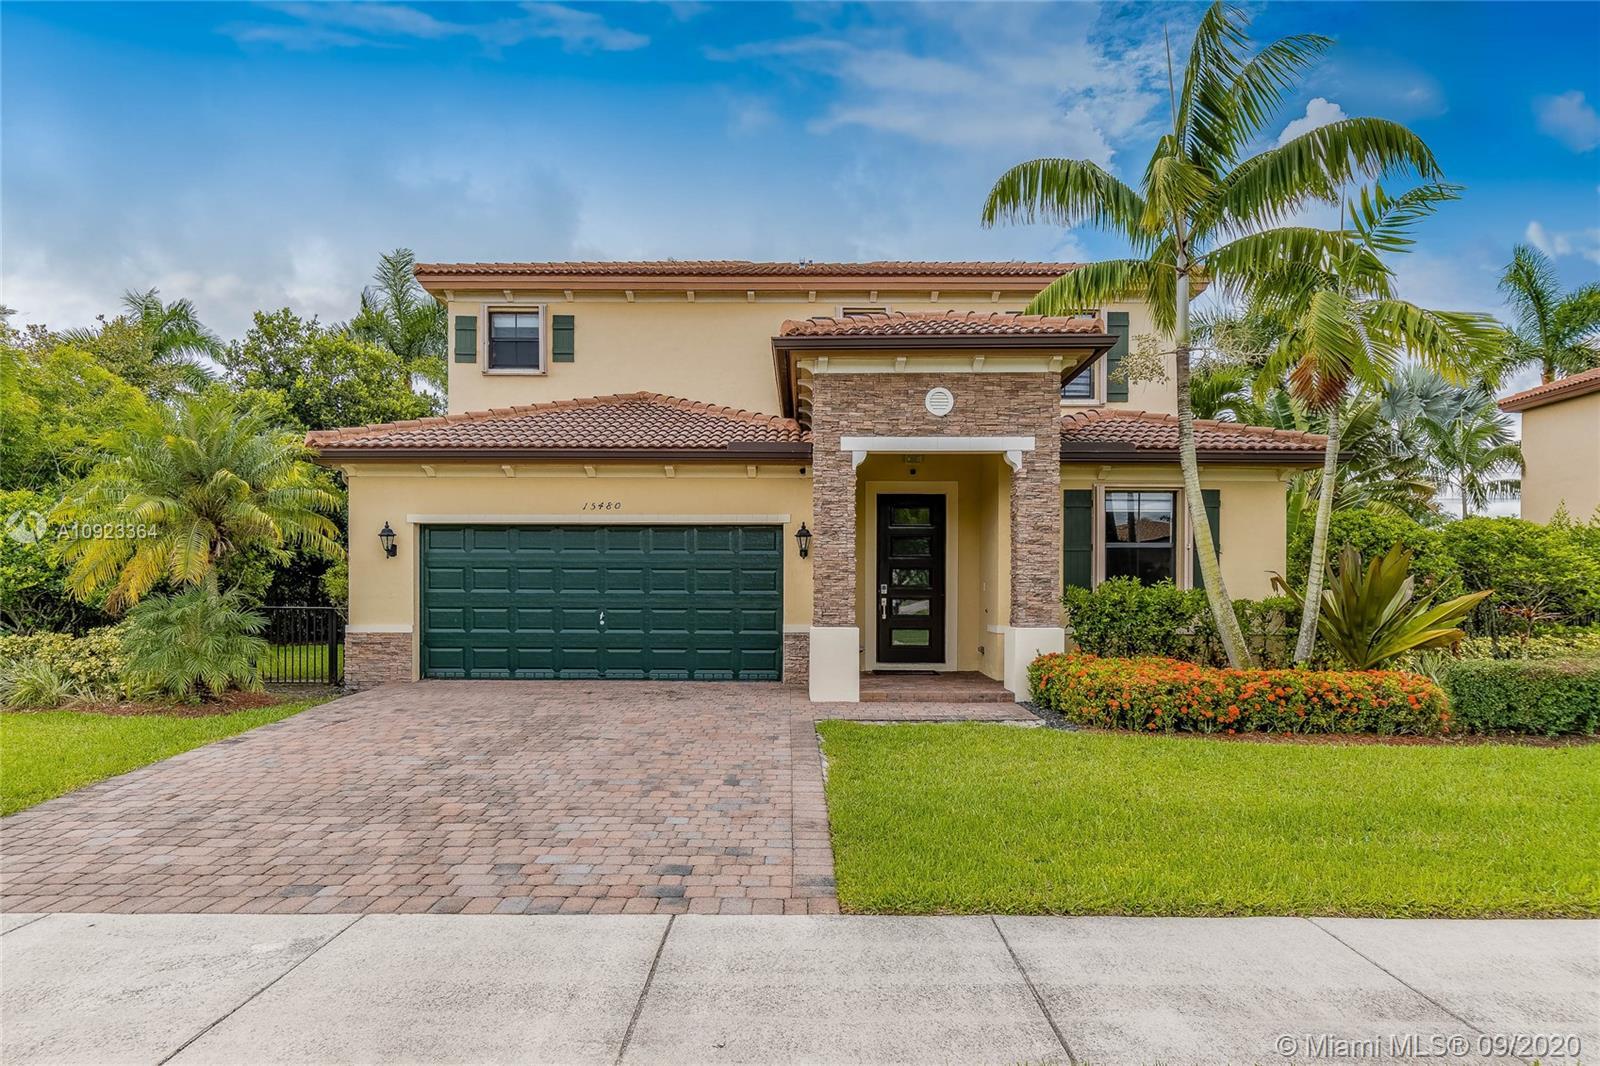 Hammocks - 15480 SW 119 Terrace, Miami, FL 33196